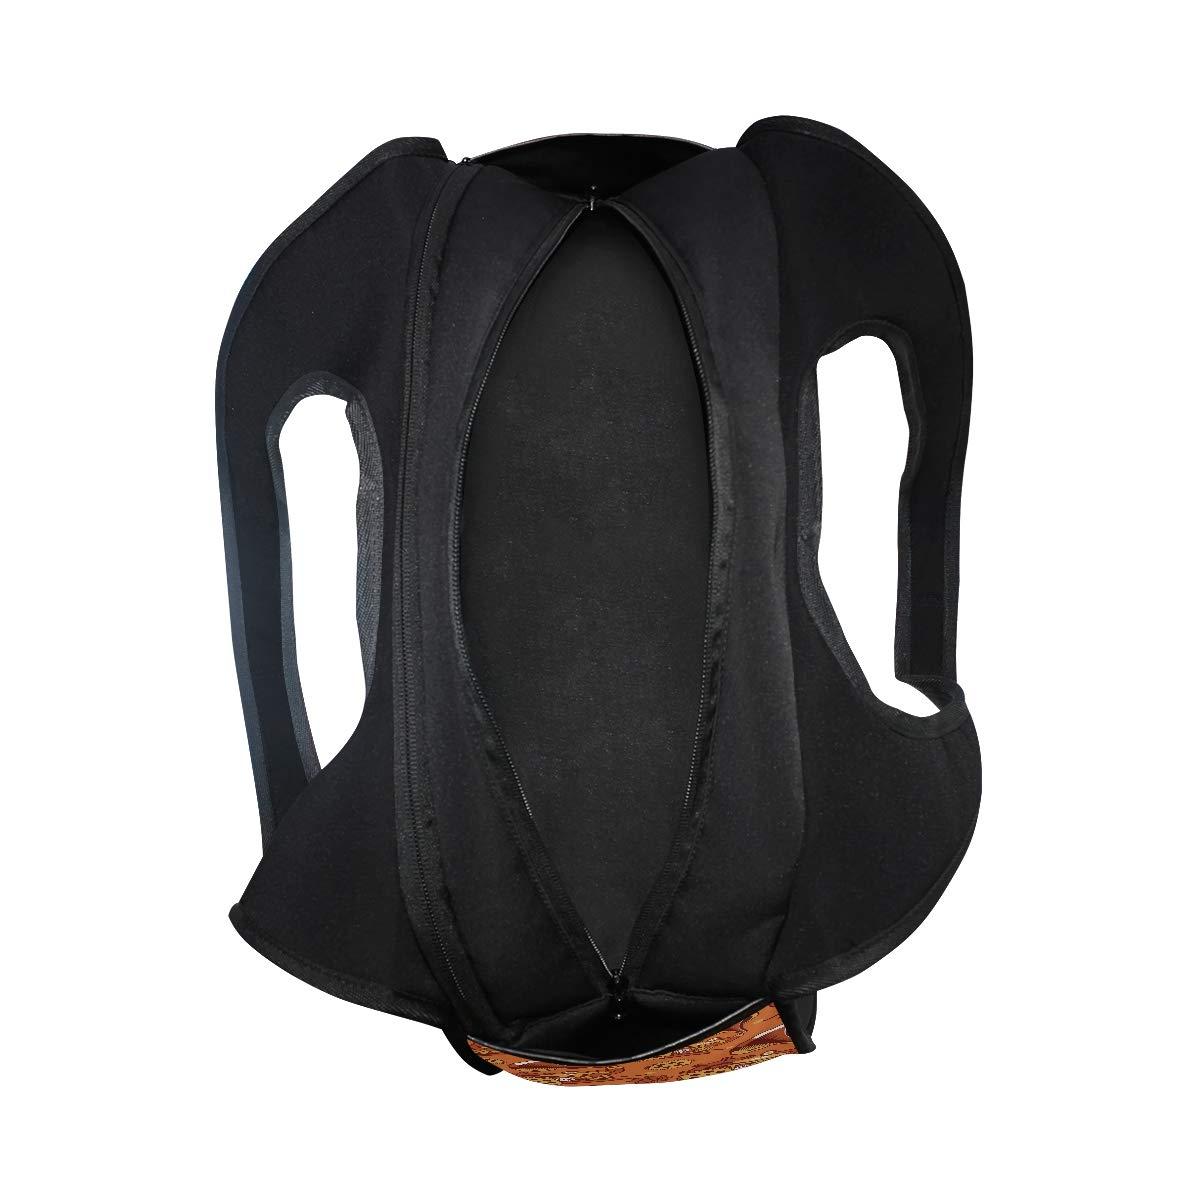 Gym Bag Sports Holdall Steampunk Mechanism Canvas Shoulder Bag Overnight Travel Bag for Men and Women